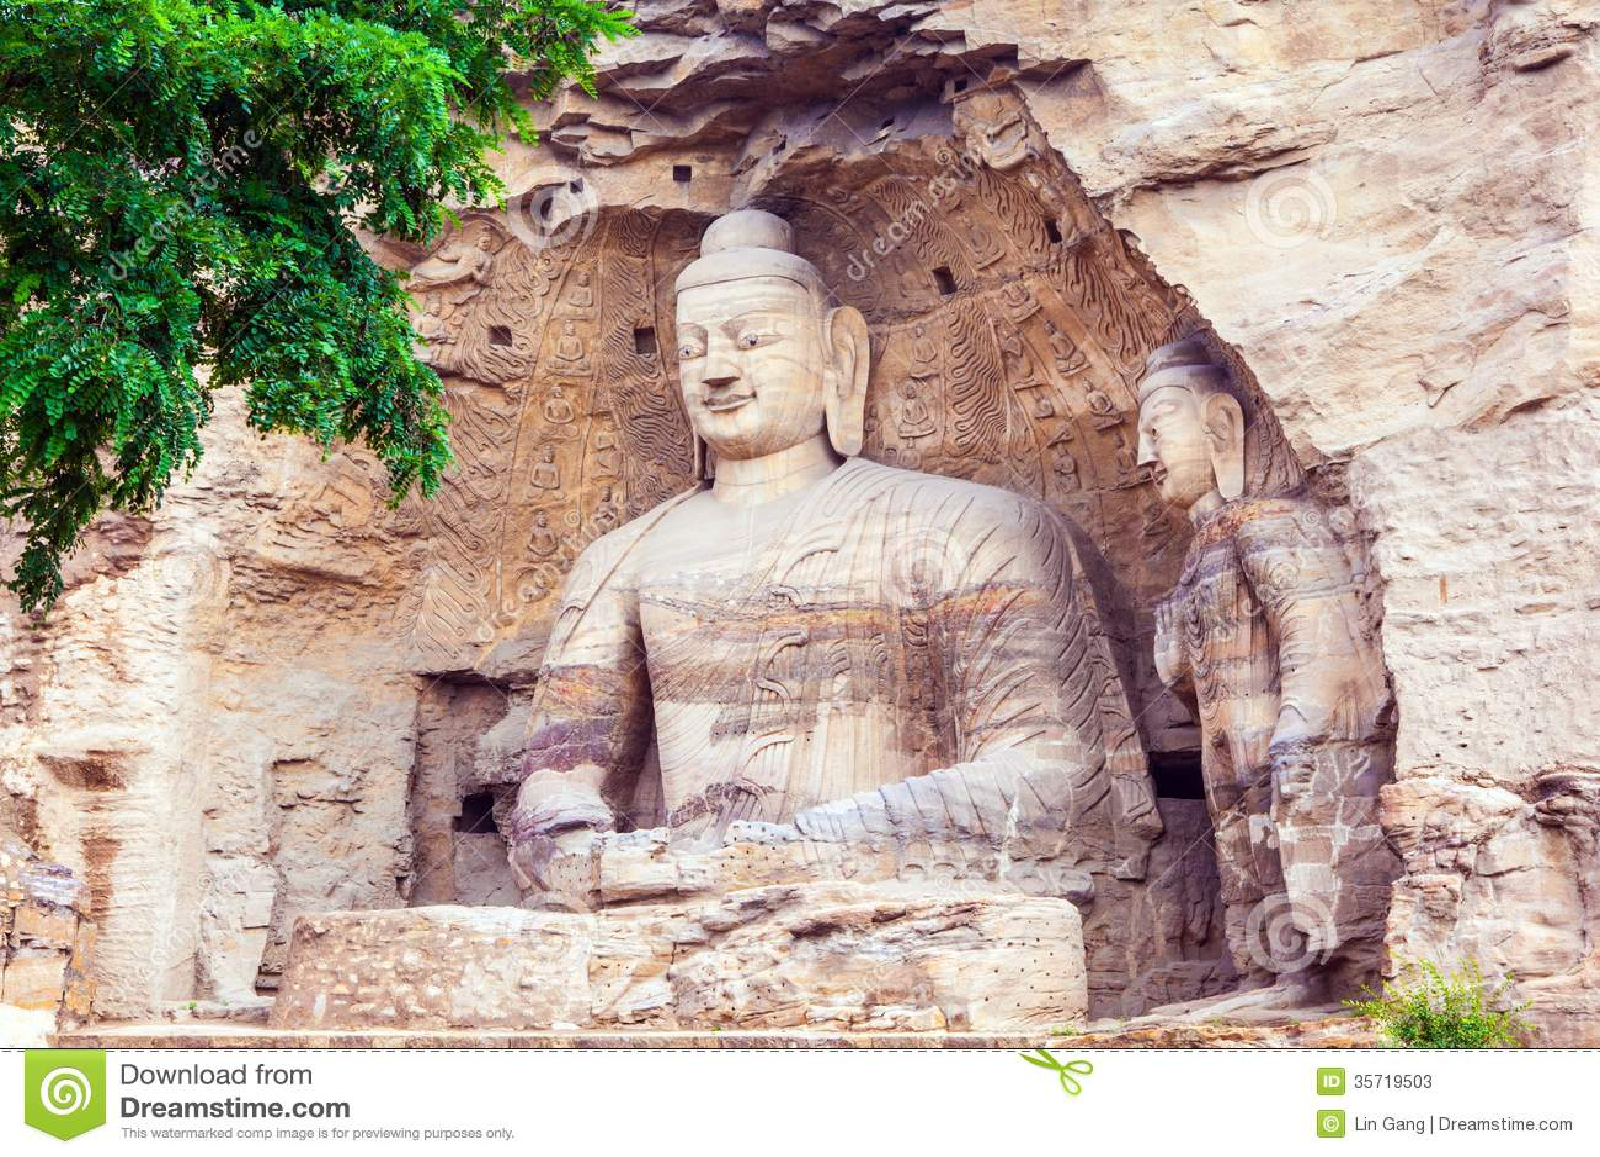 Najzanimljivije  pećine na svijetu - Page 4 Yungang-grottoes-world-cultural-heritage-one-china-s-four-most-famous-buddhist-caves-art-treasure-houses-located-datong-35719503